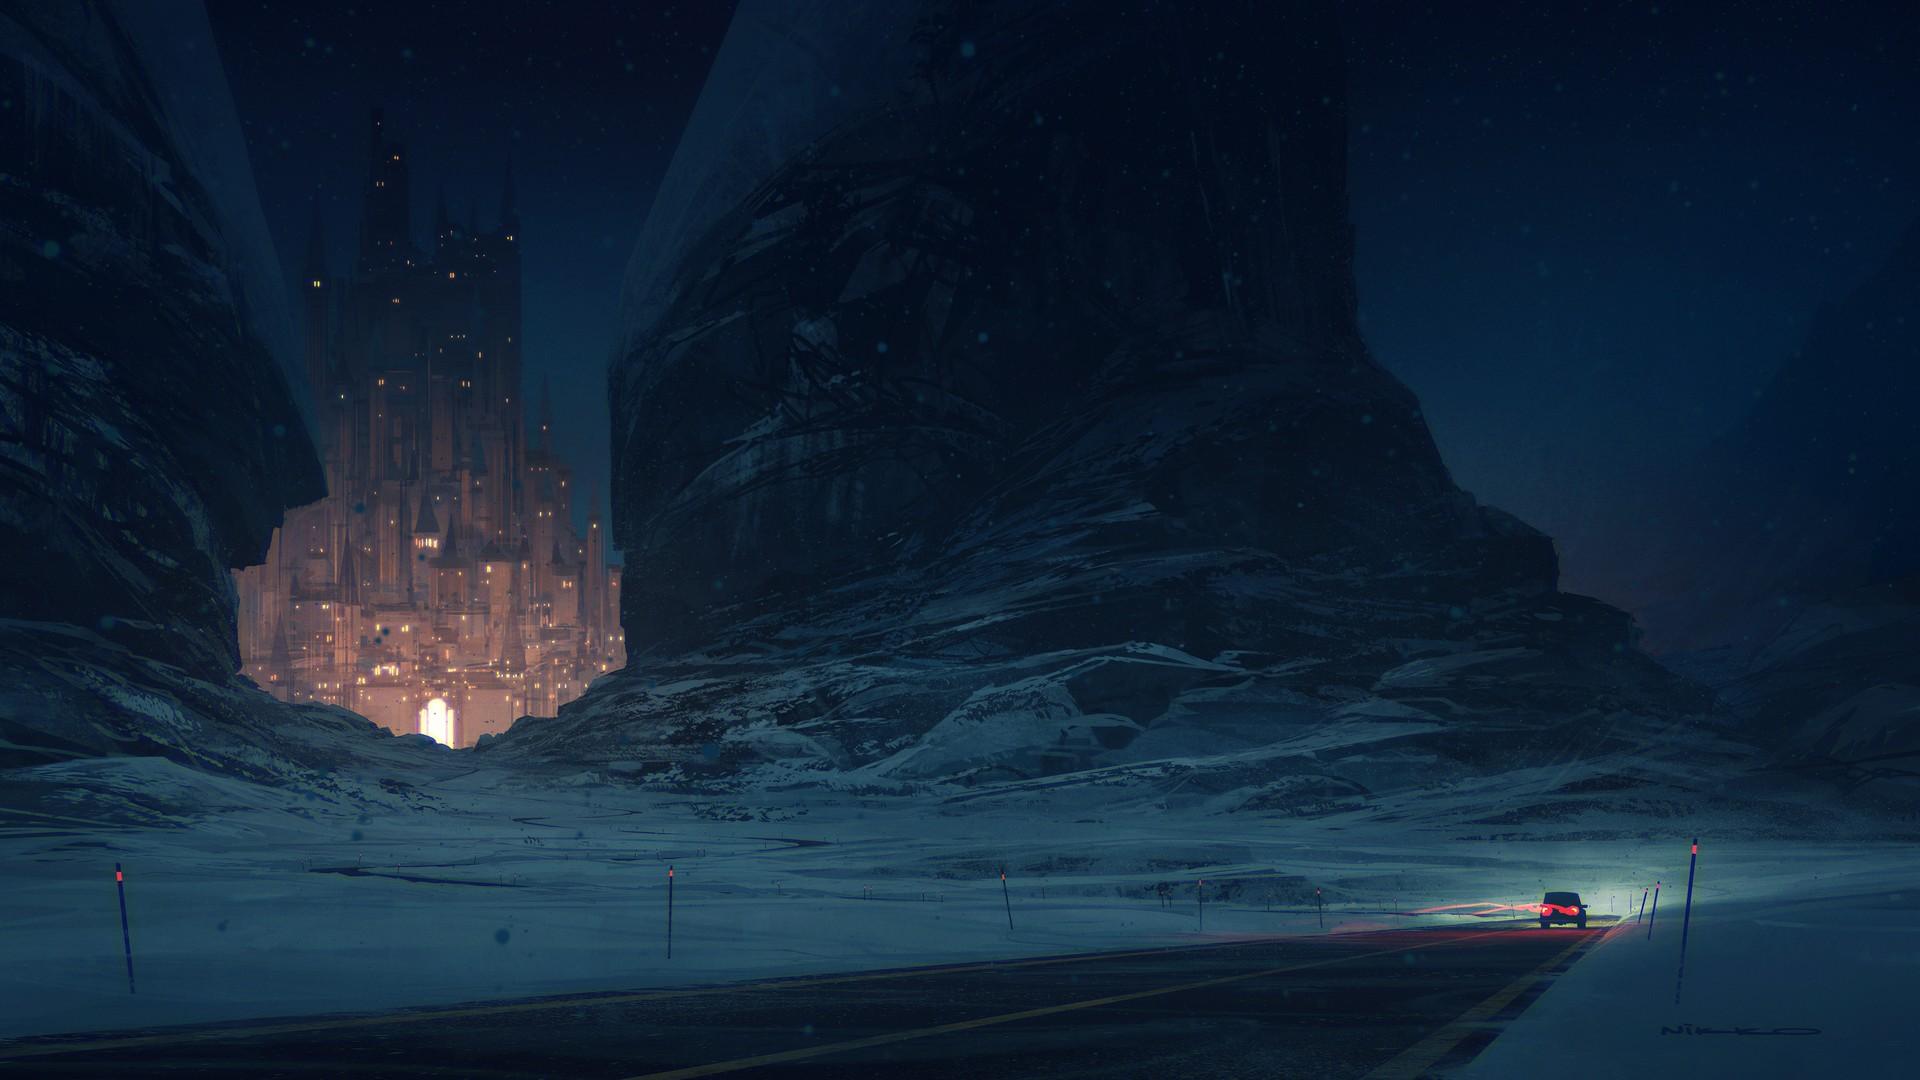 General 1920x1080 Nikolai Lockertsen artwork digital art car castle snow mountains